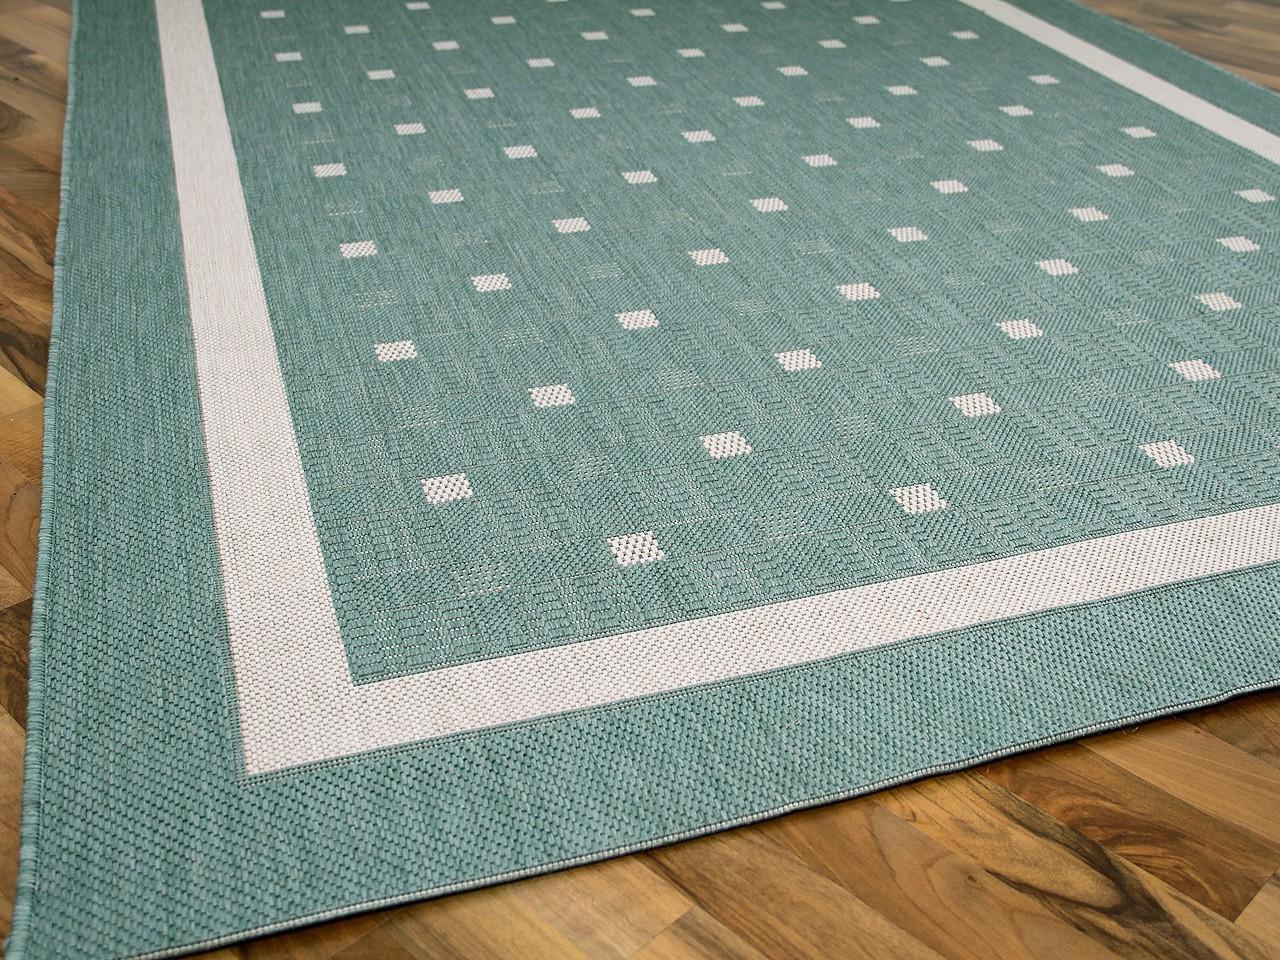 Teppich mintgrün  Modern Flachgewebe Ruggy Mintgrün Bordüre Teppiche Sisal und ...